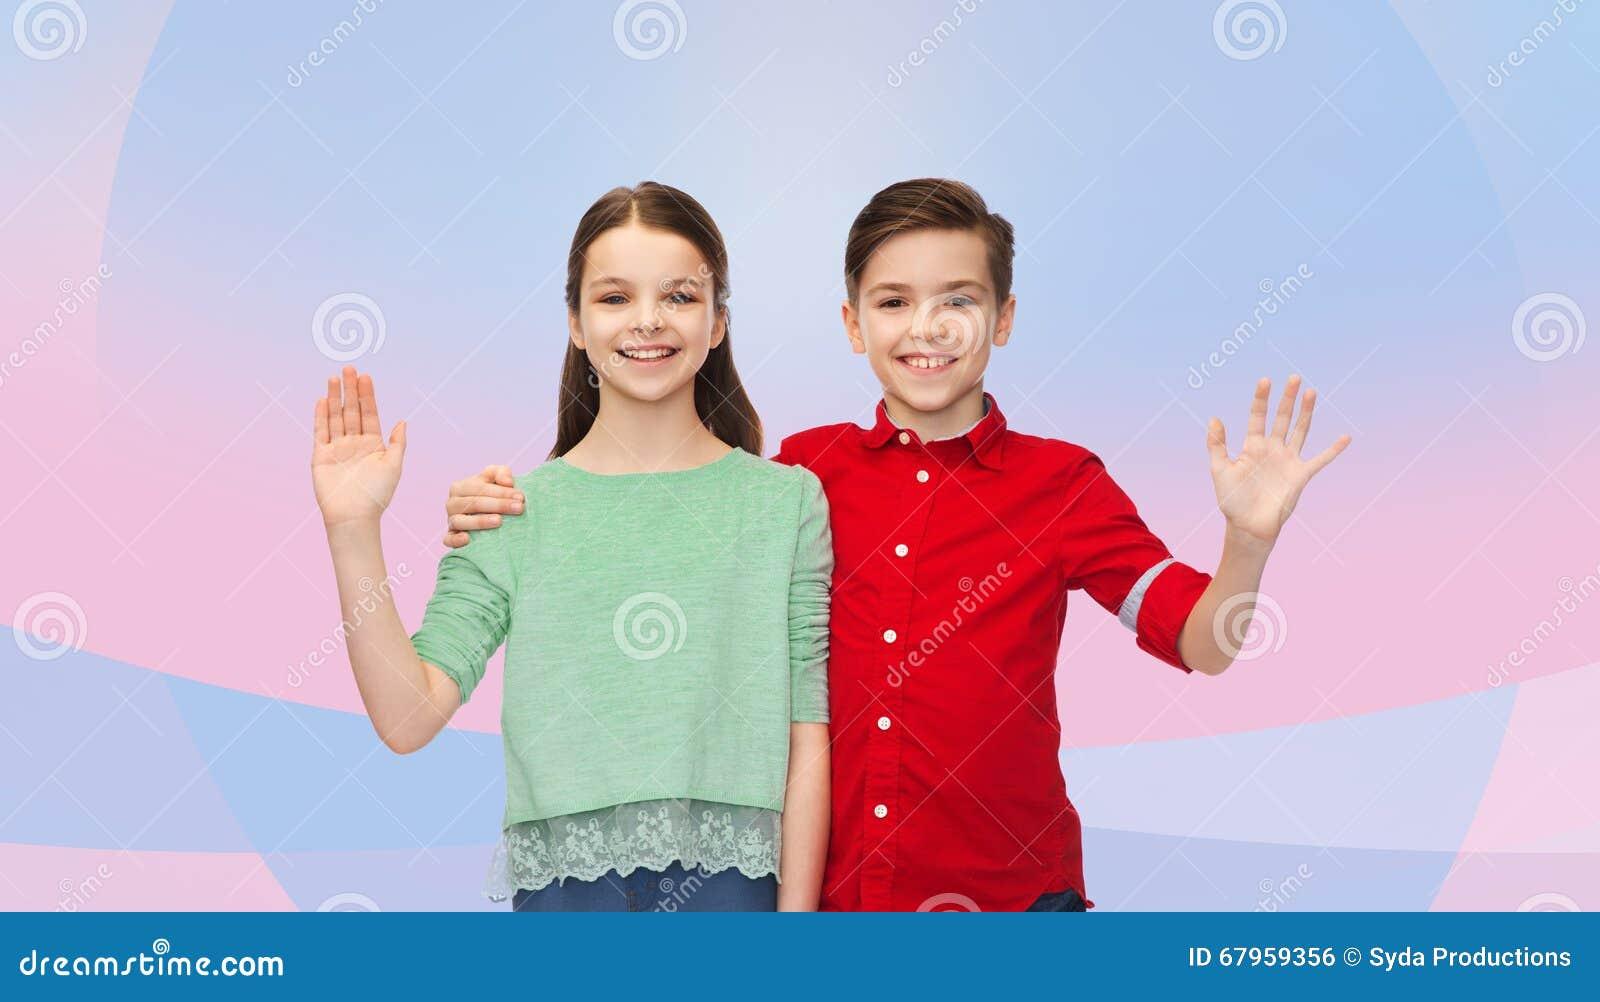 Happy Boy And Girl Waving Hand Stock Photo - Image: 67959356